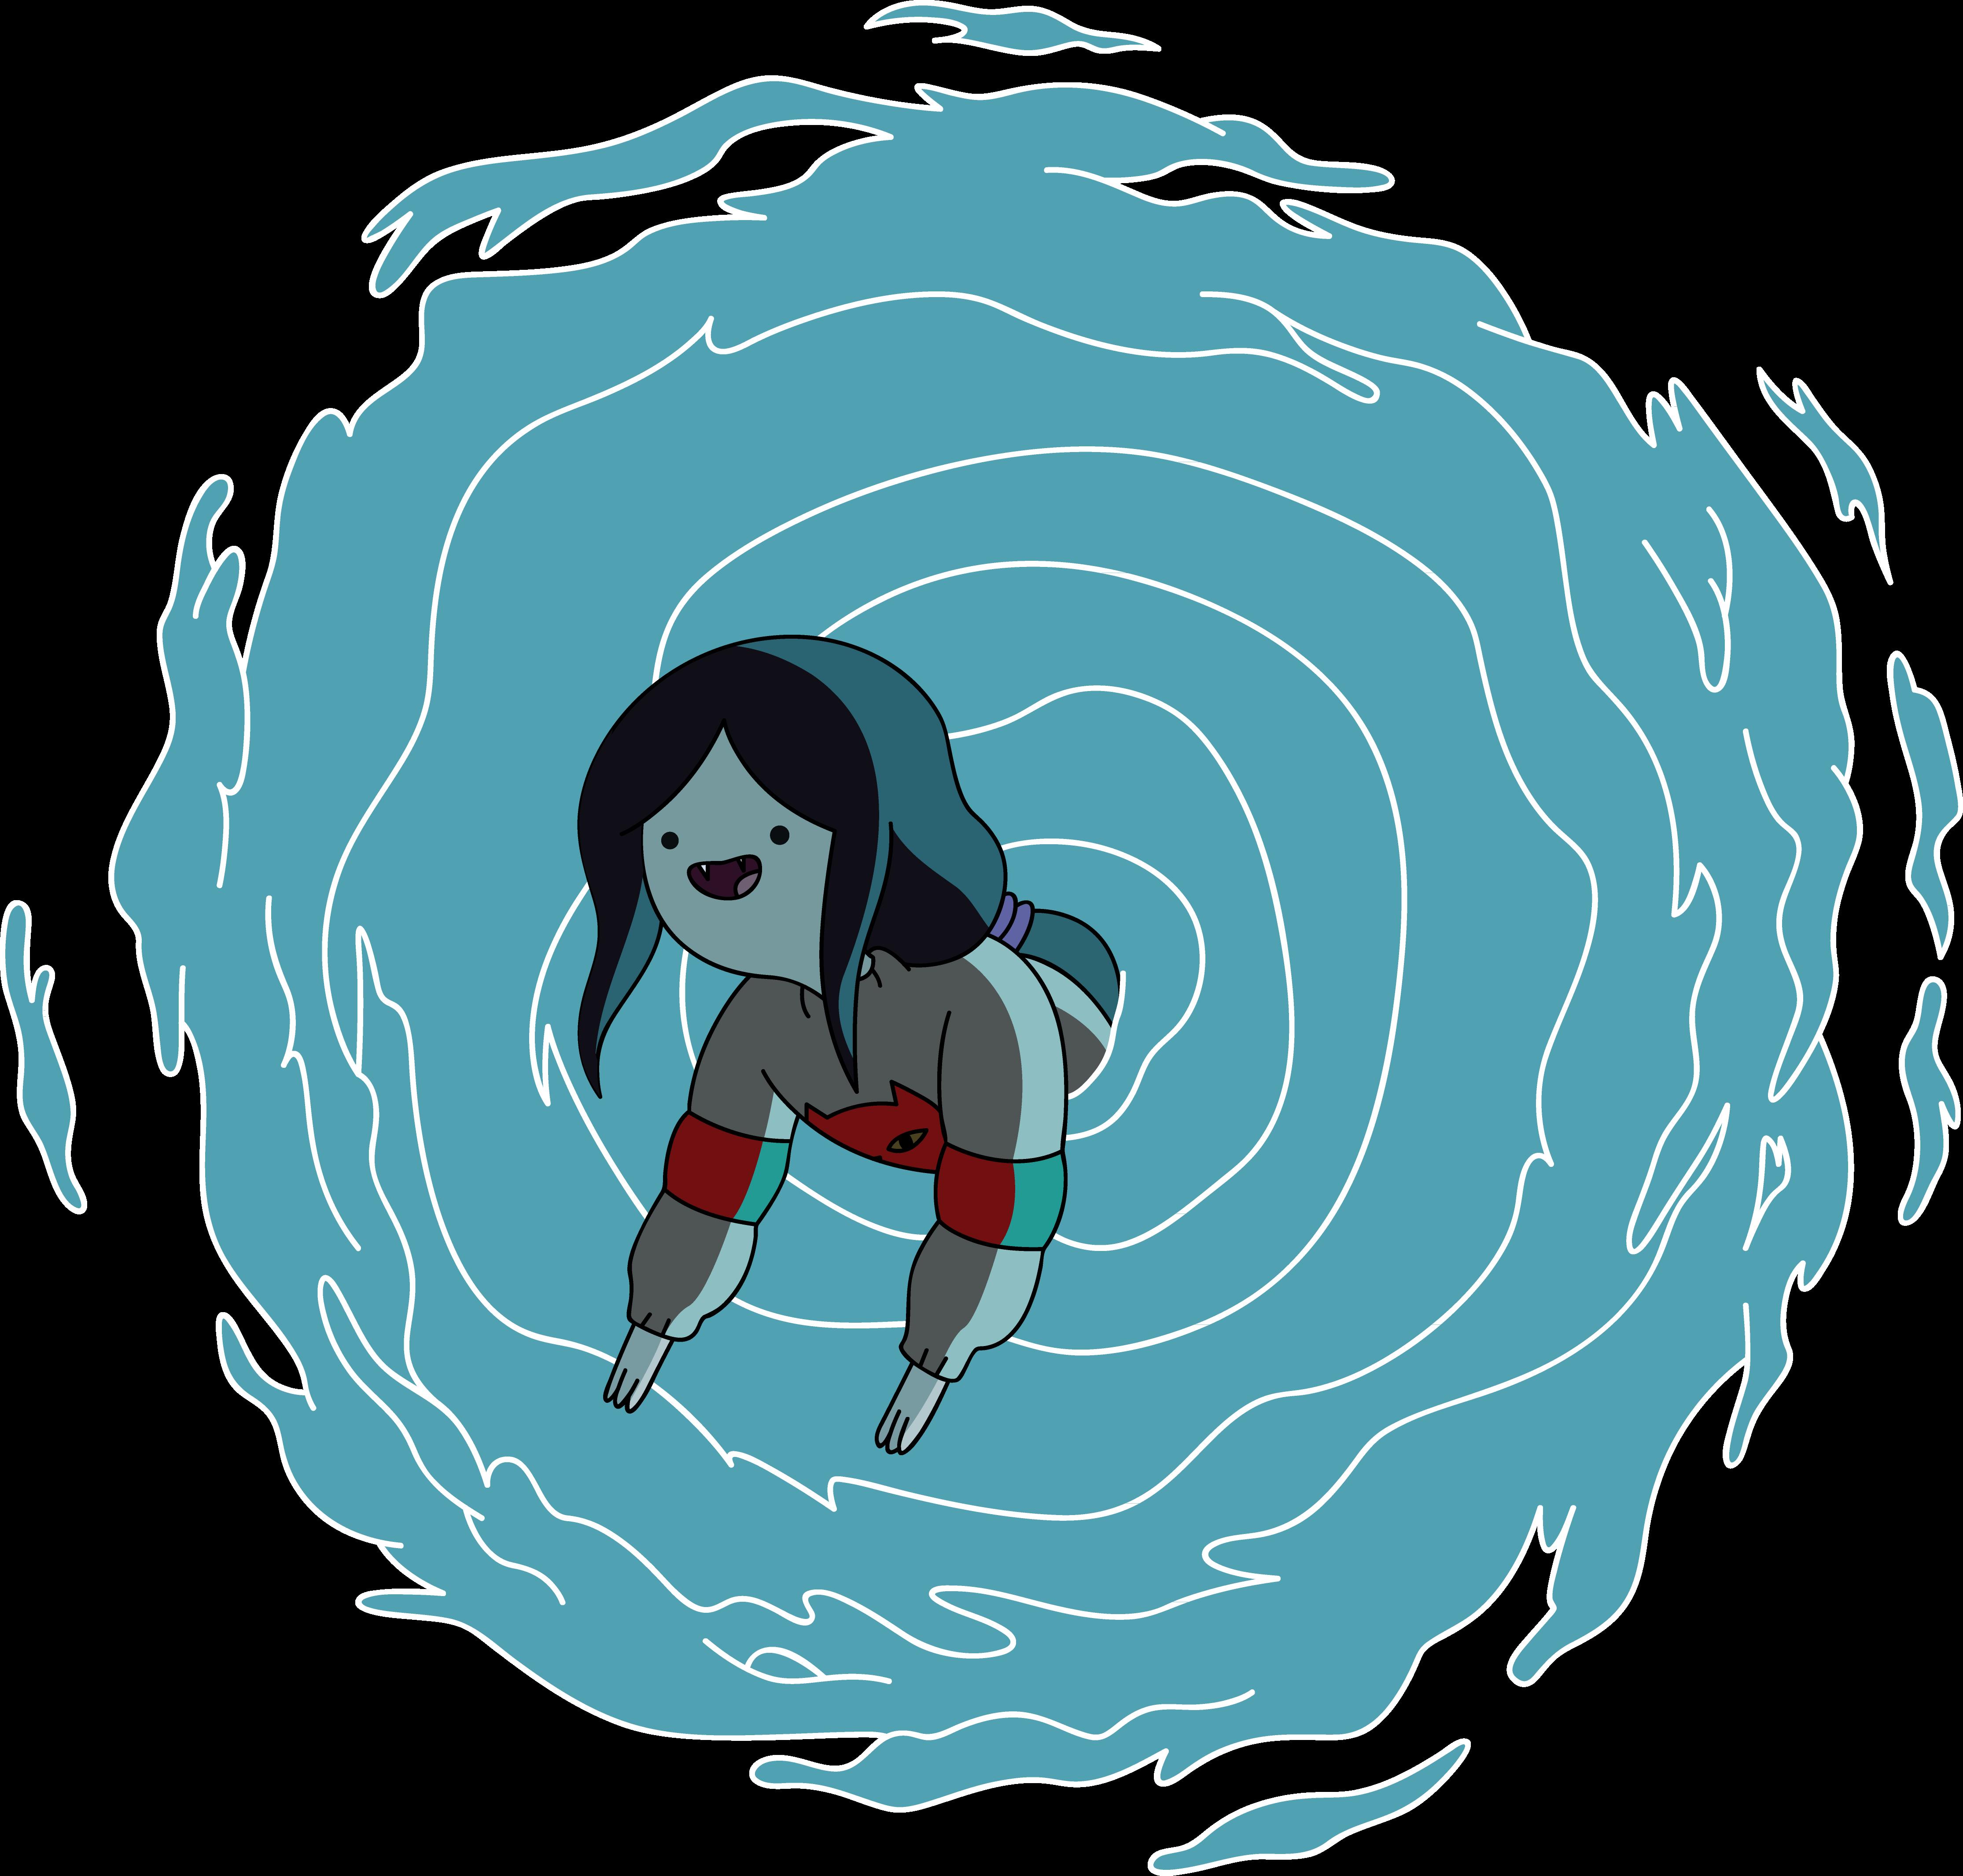 Portal Marcie by sircinnamon